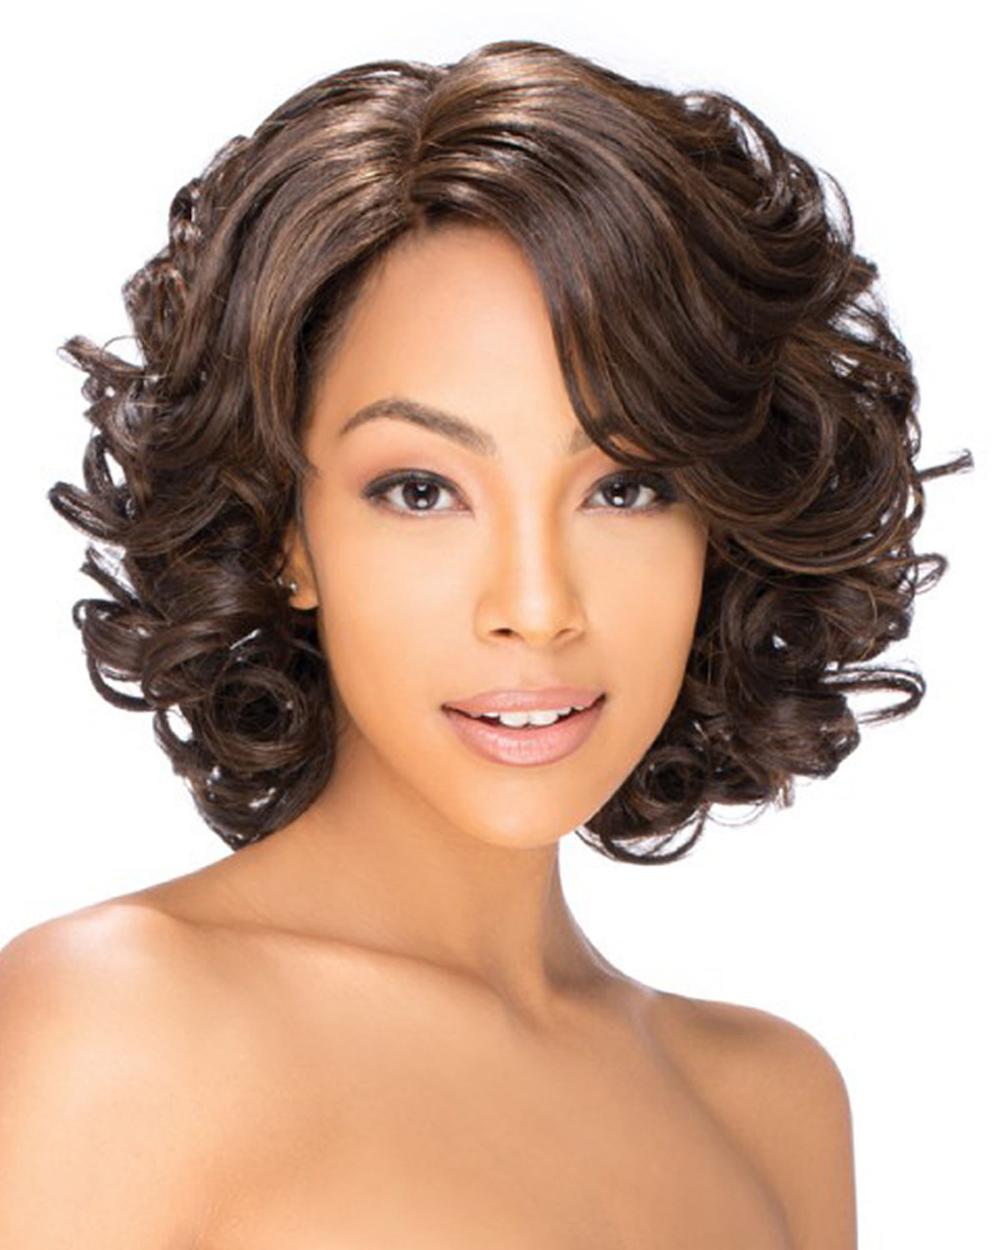 Buy Wigs Online African American - Bmo Show